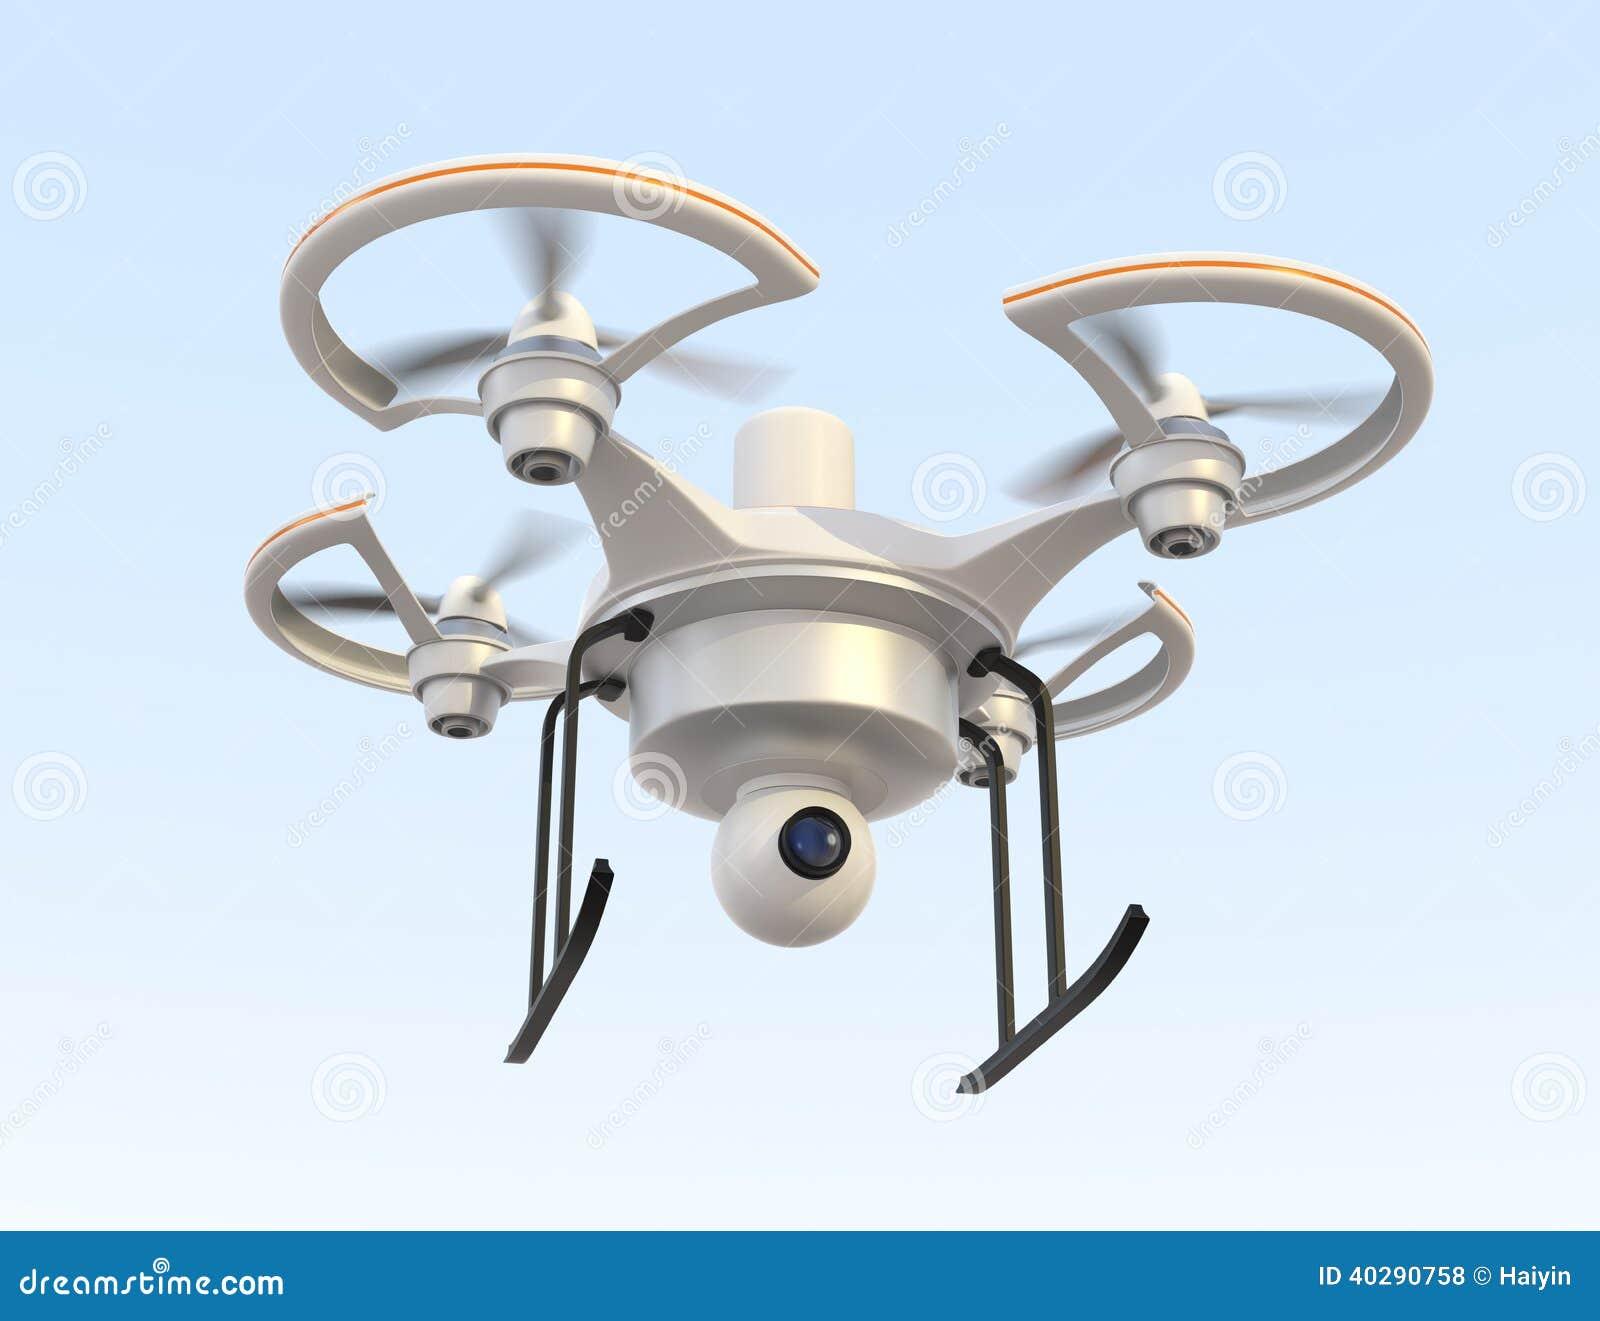 Проветрите трутня с летанием камеры в небе